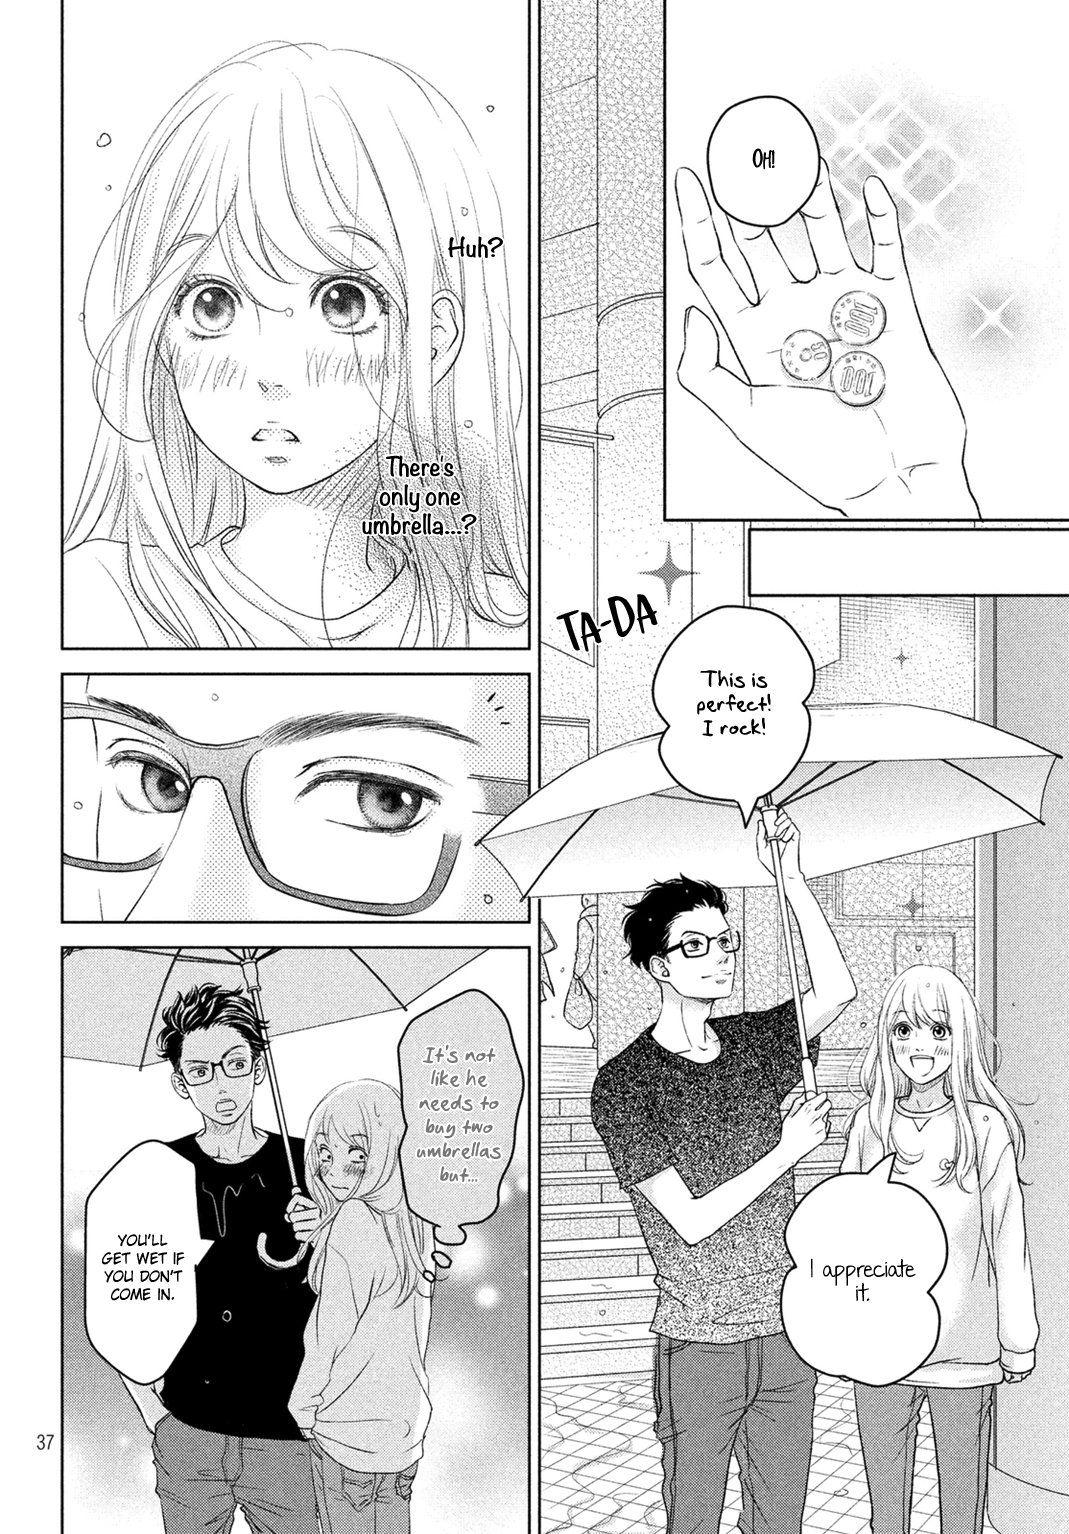 Living No Matsunaga San Vol 1 Ch 1 Mangapark Read Online For Free Chapter Shoujo Manga San